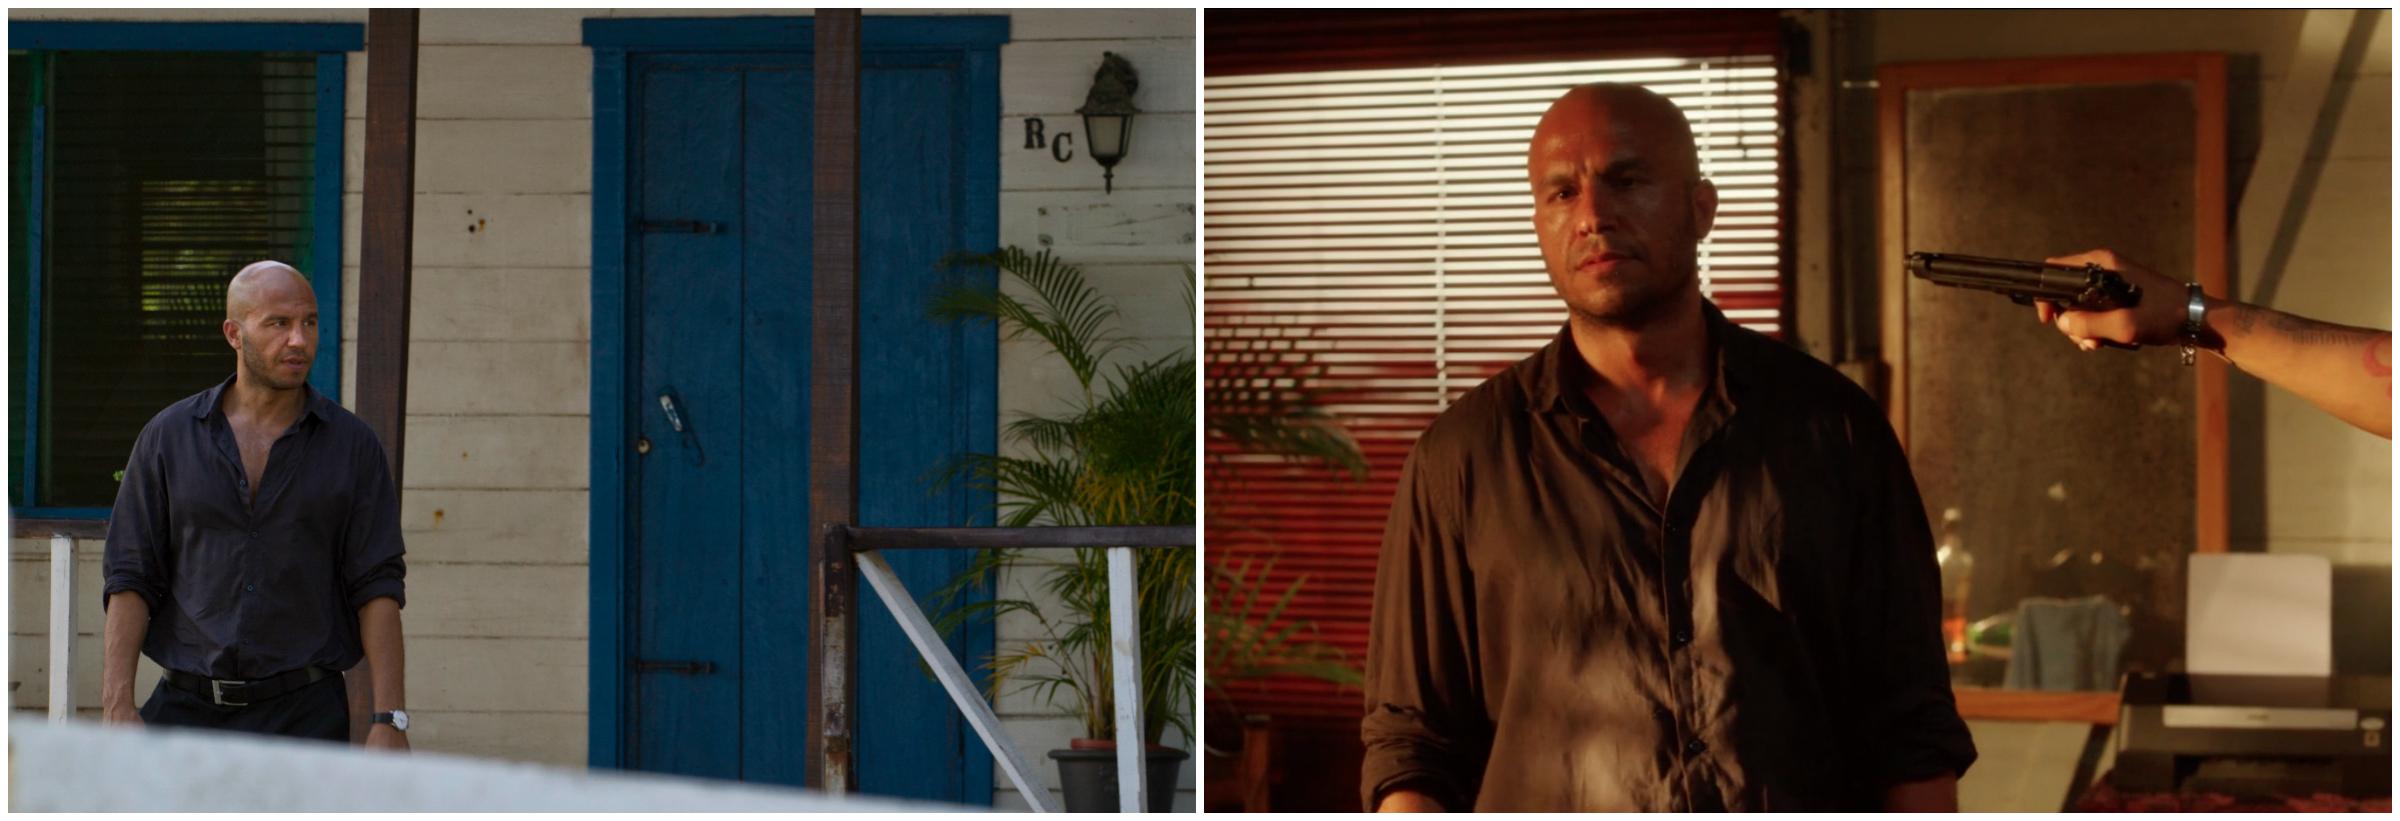 "Danish actor Dar Salim, as Abbas,is ambushed by hit men in ""Wendt's House""."